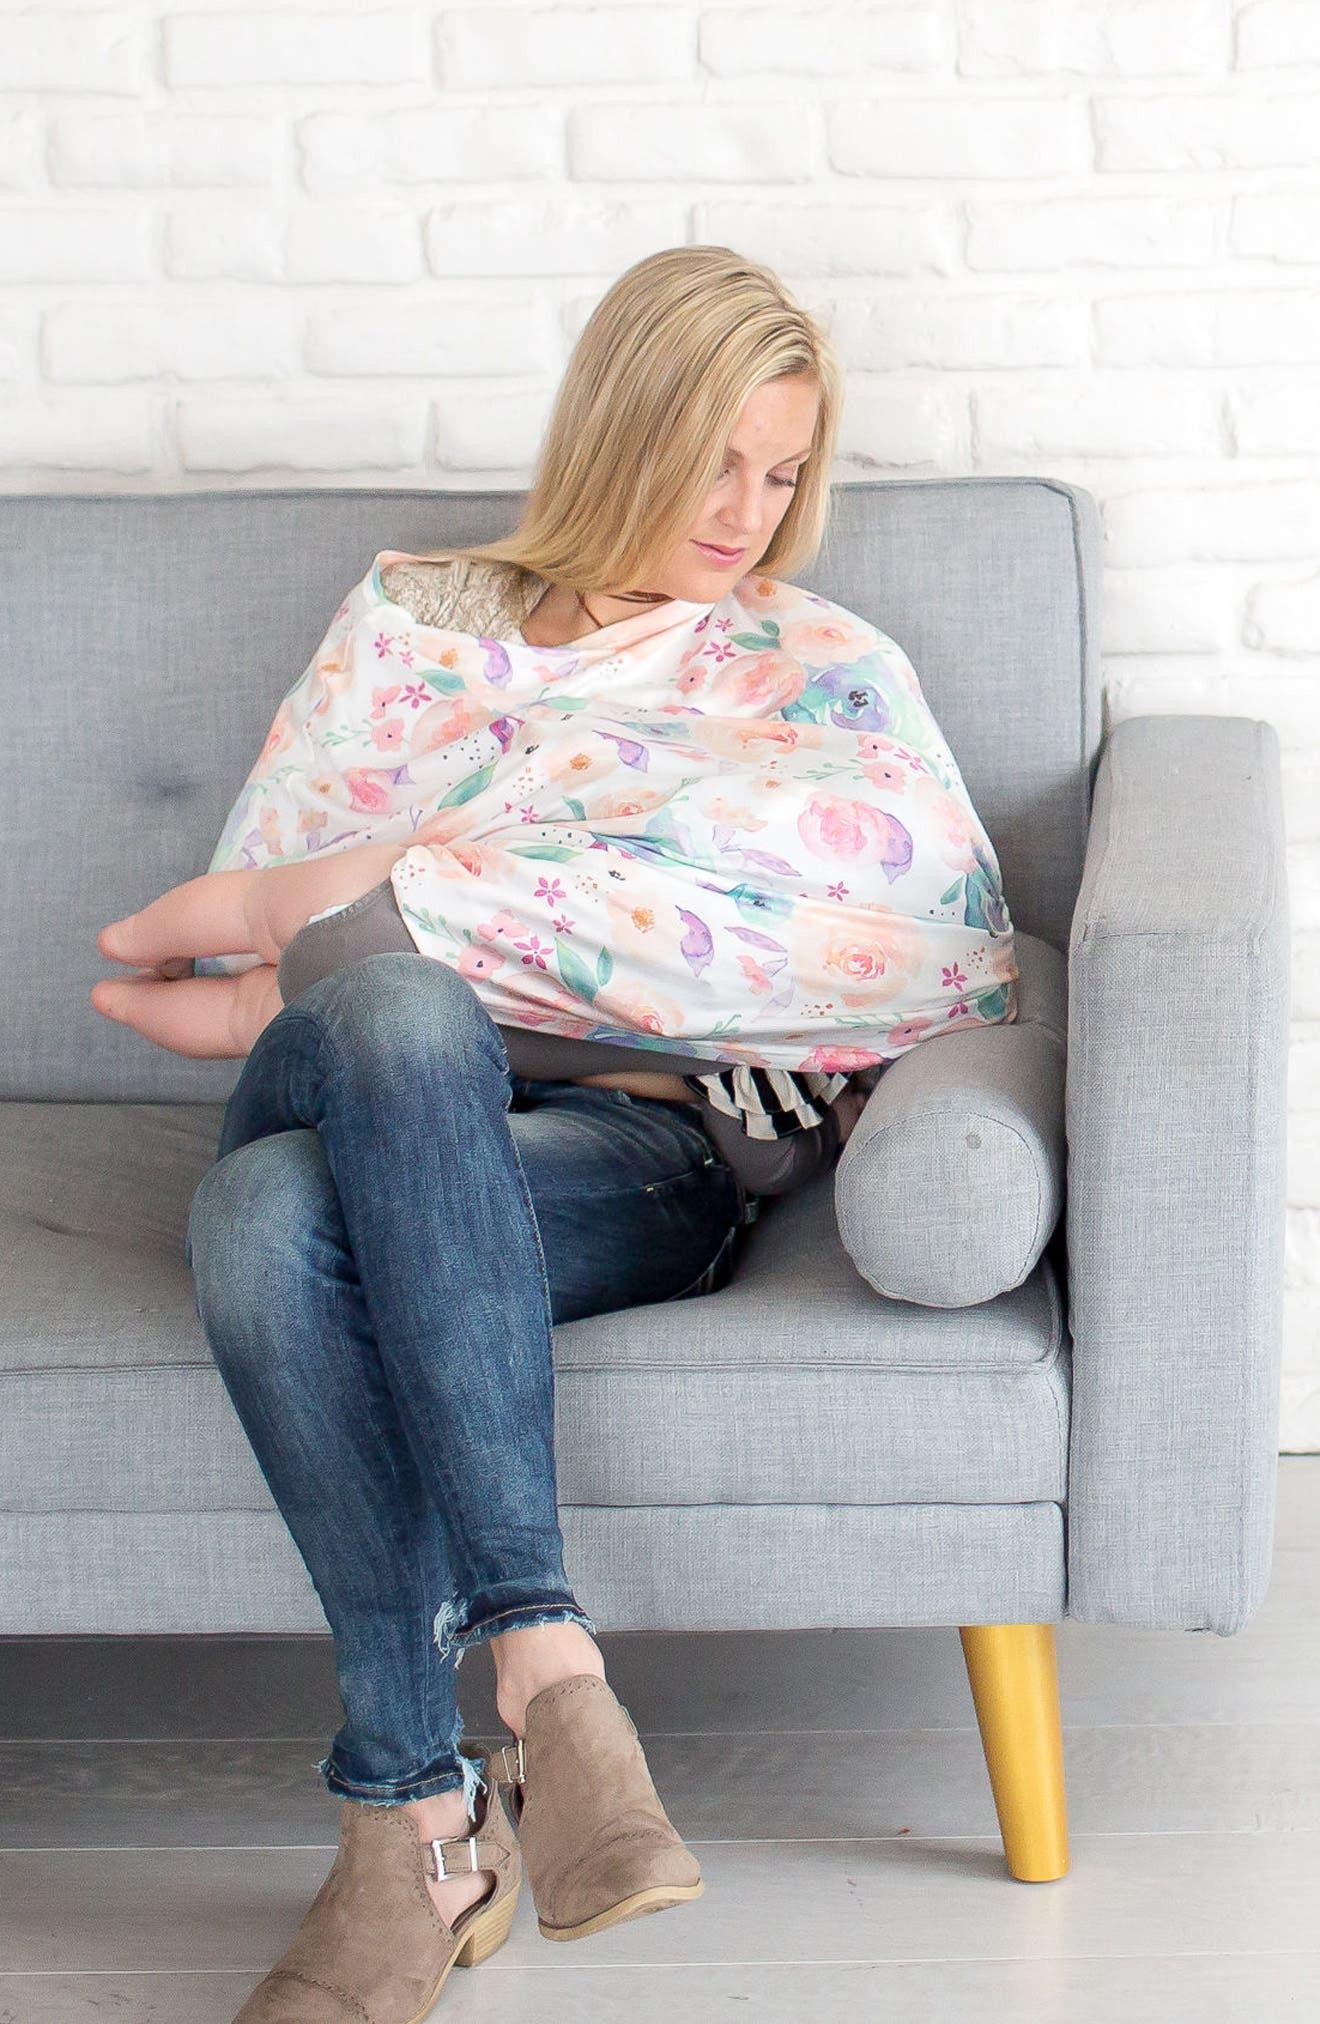 Bloom Multiuse Cover & Swaddle Blanket Gift Set,                             Alternate thumbnail 18, color,                             Bloom